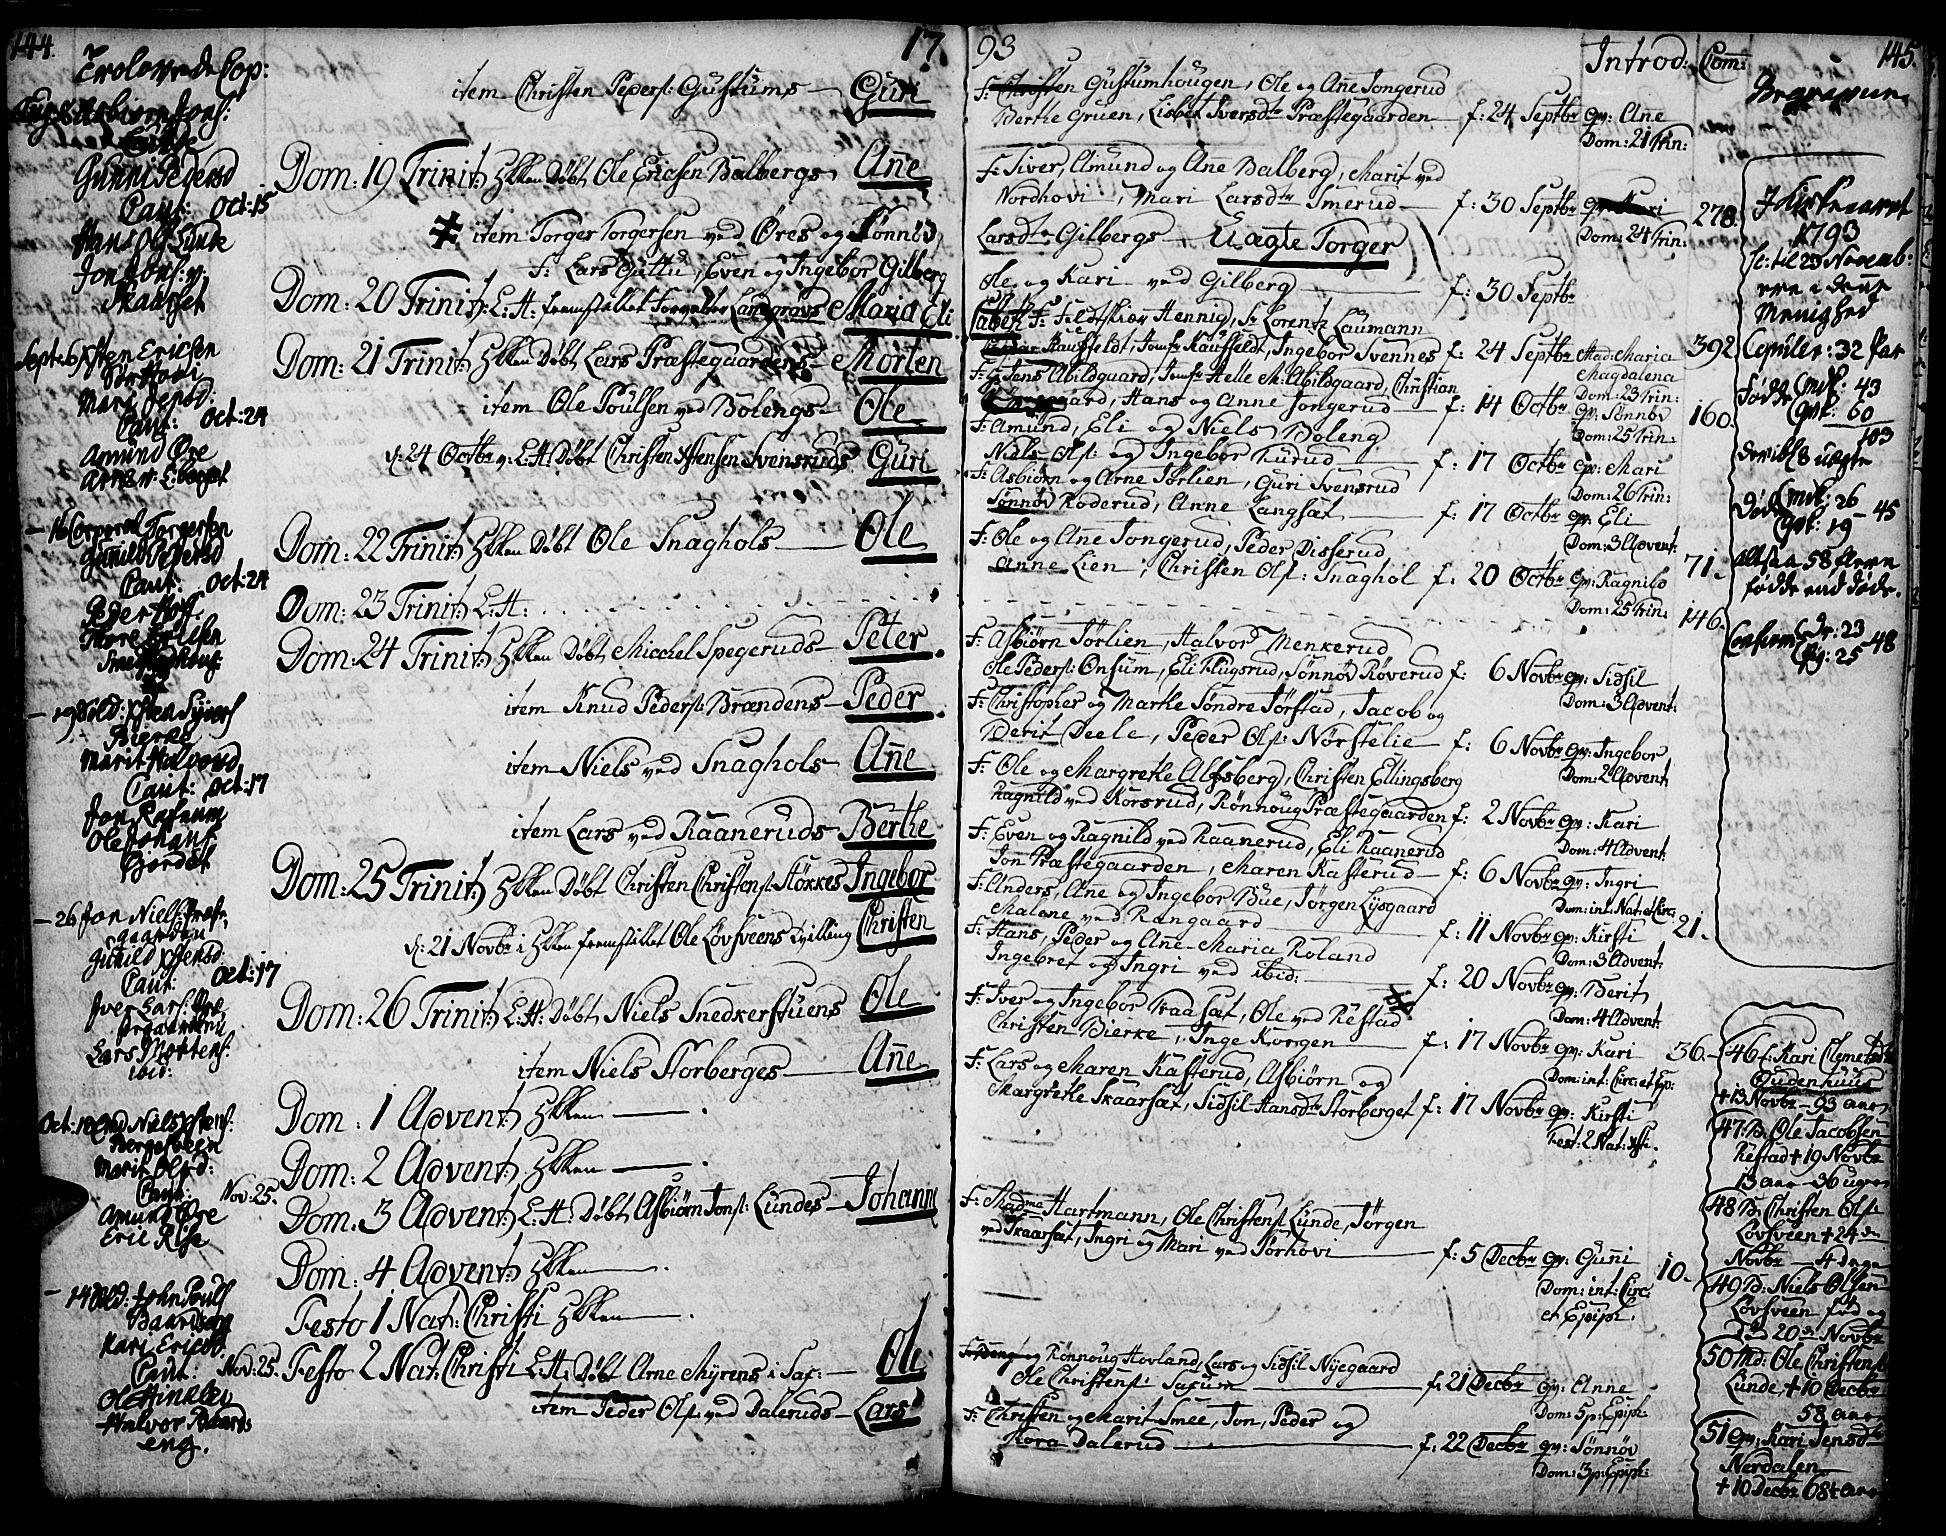 SAH, Fåberg prestekontor, Ministerialbok nr. 2, 1775-1818, s. 144-145